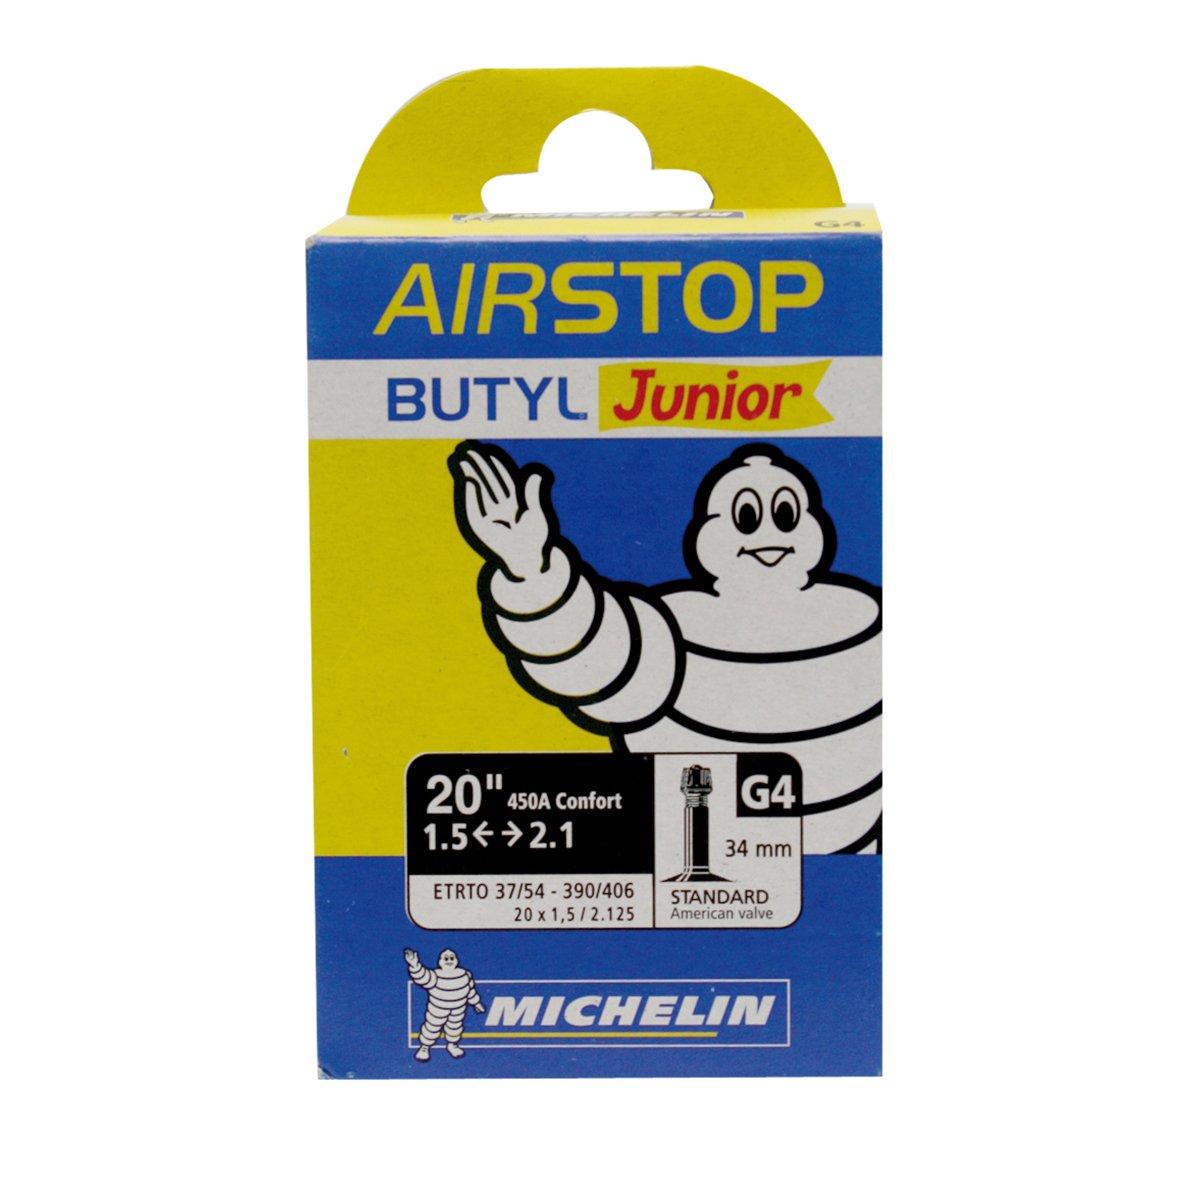 Michelin AIRSTOP BTT JUNIOR - Camara de bicicleta 37/54-390/406 Standard 34 mm Cicli Bonin_091082